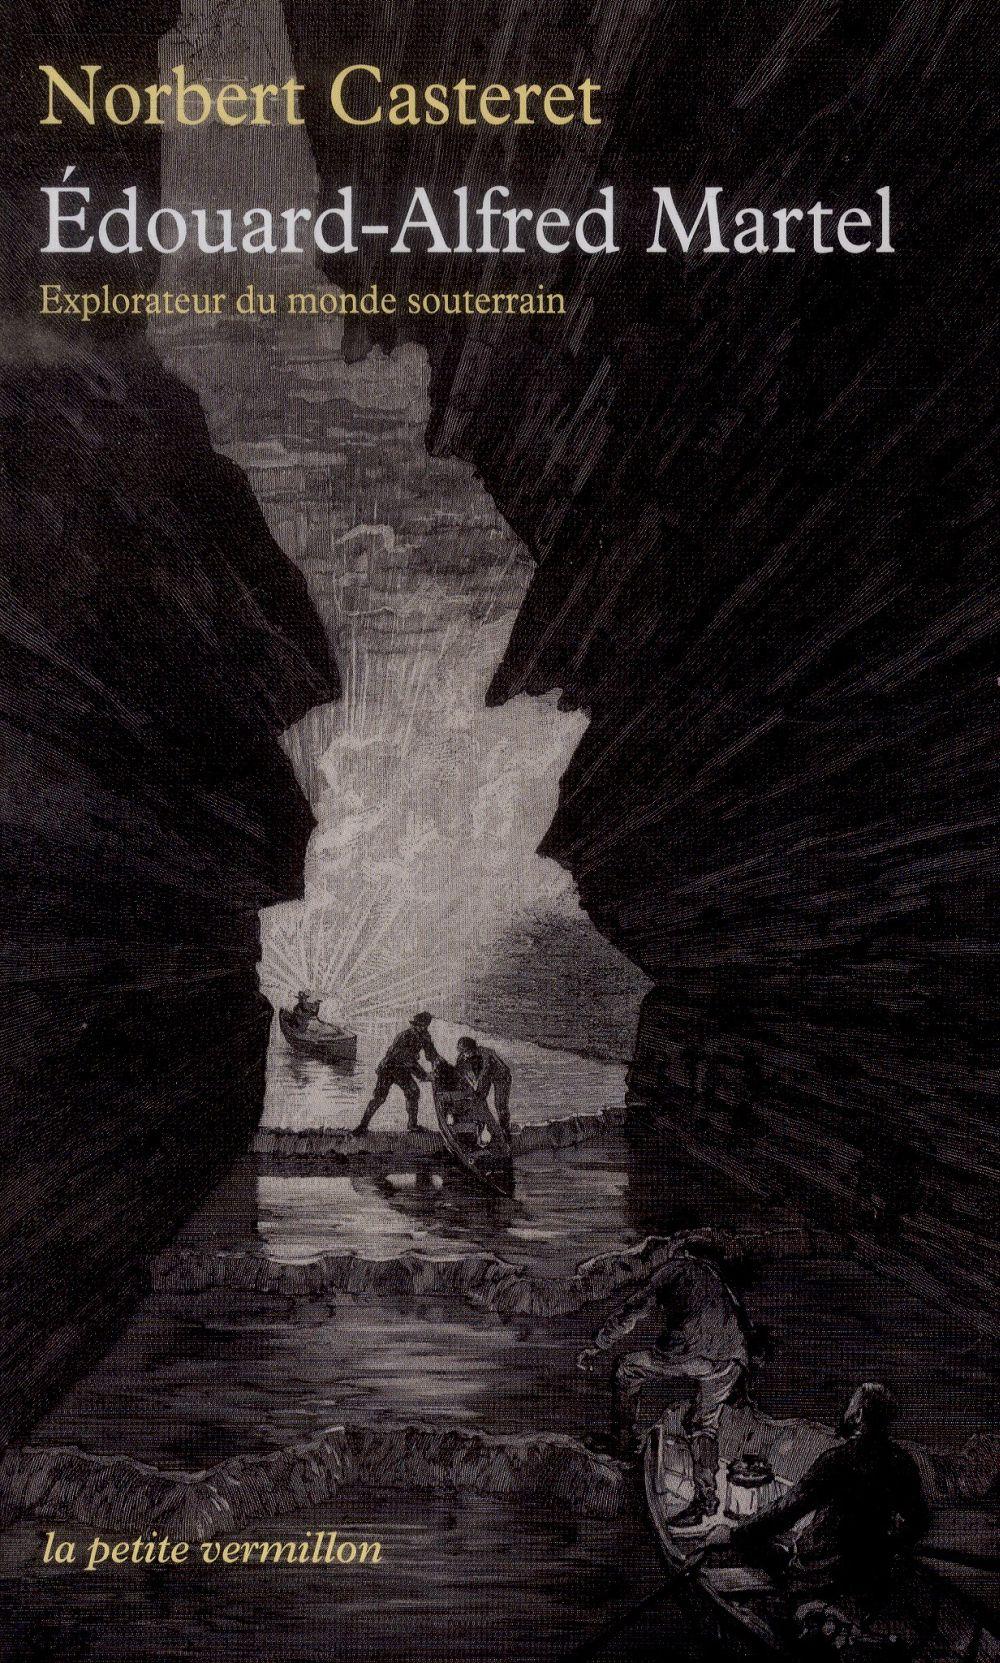 EDOUARD-ALFRED MARTEL - EXPLORATEUR DU MONDE SOUTERRAIN